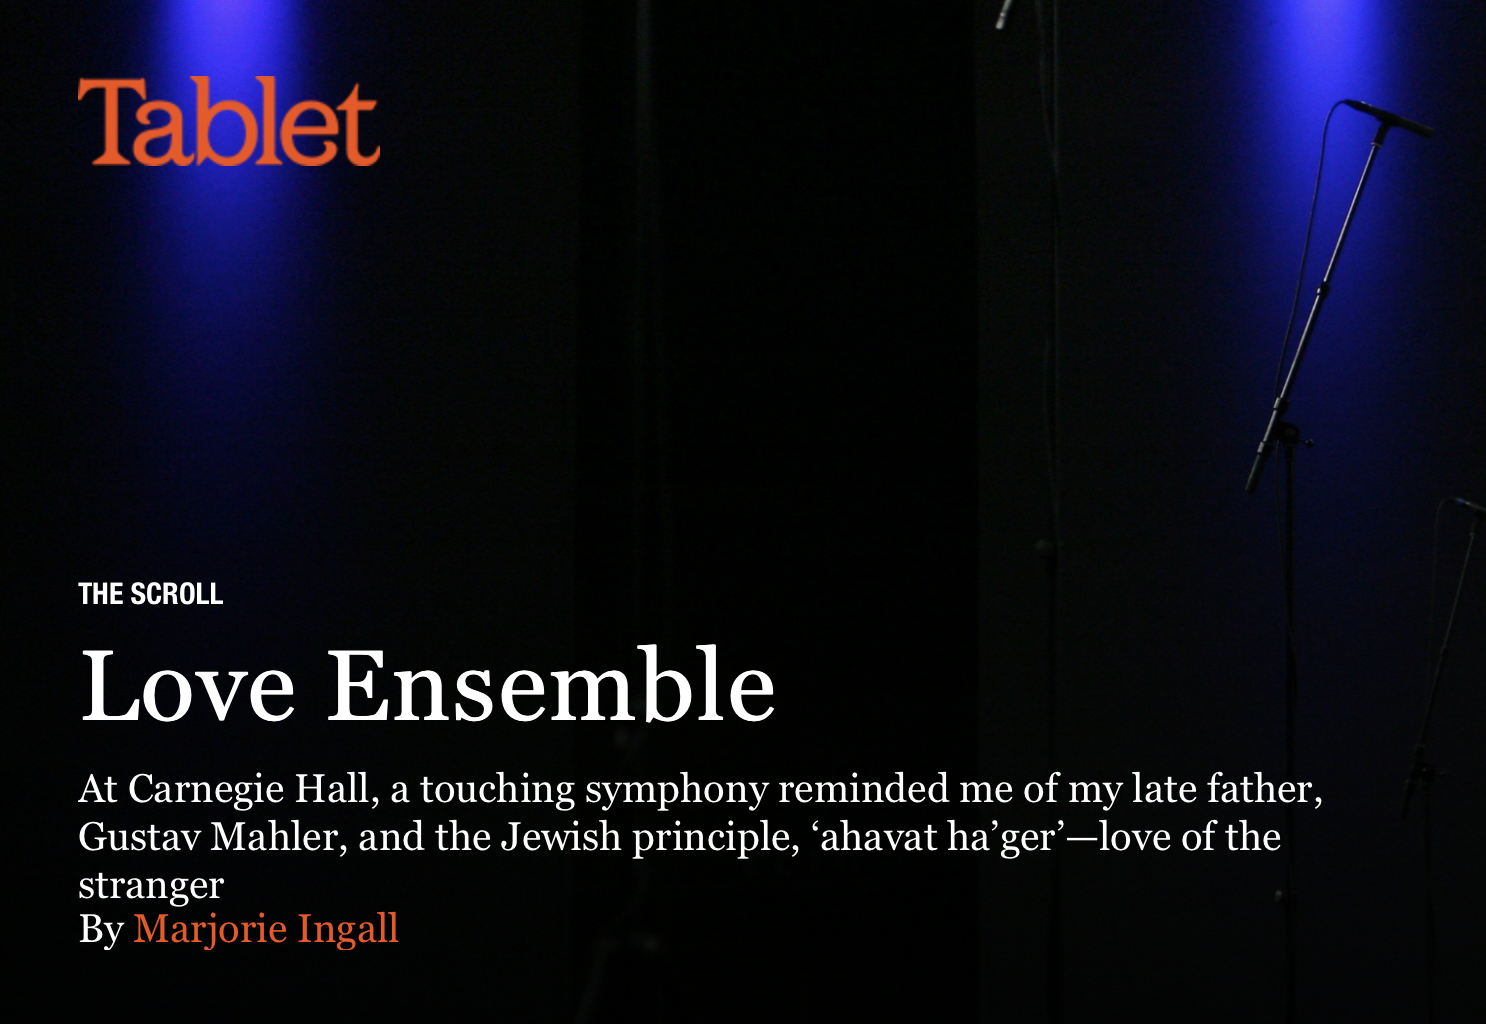 Love Ensemble - Tablet